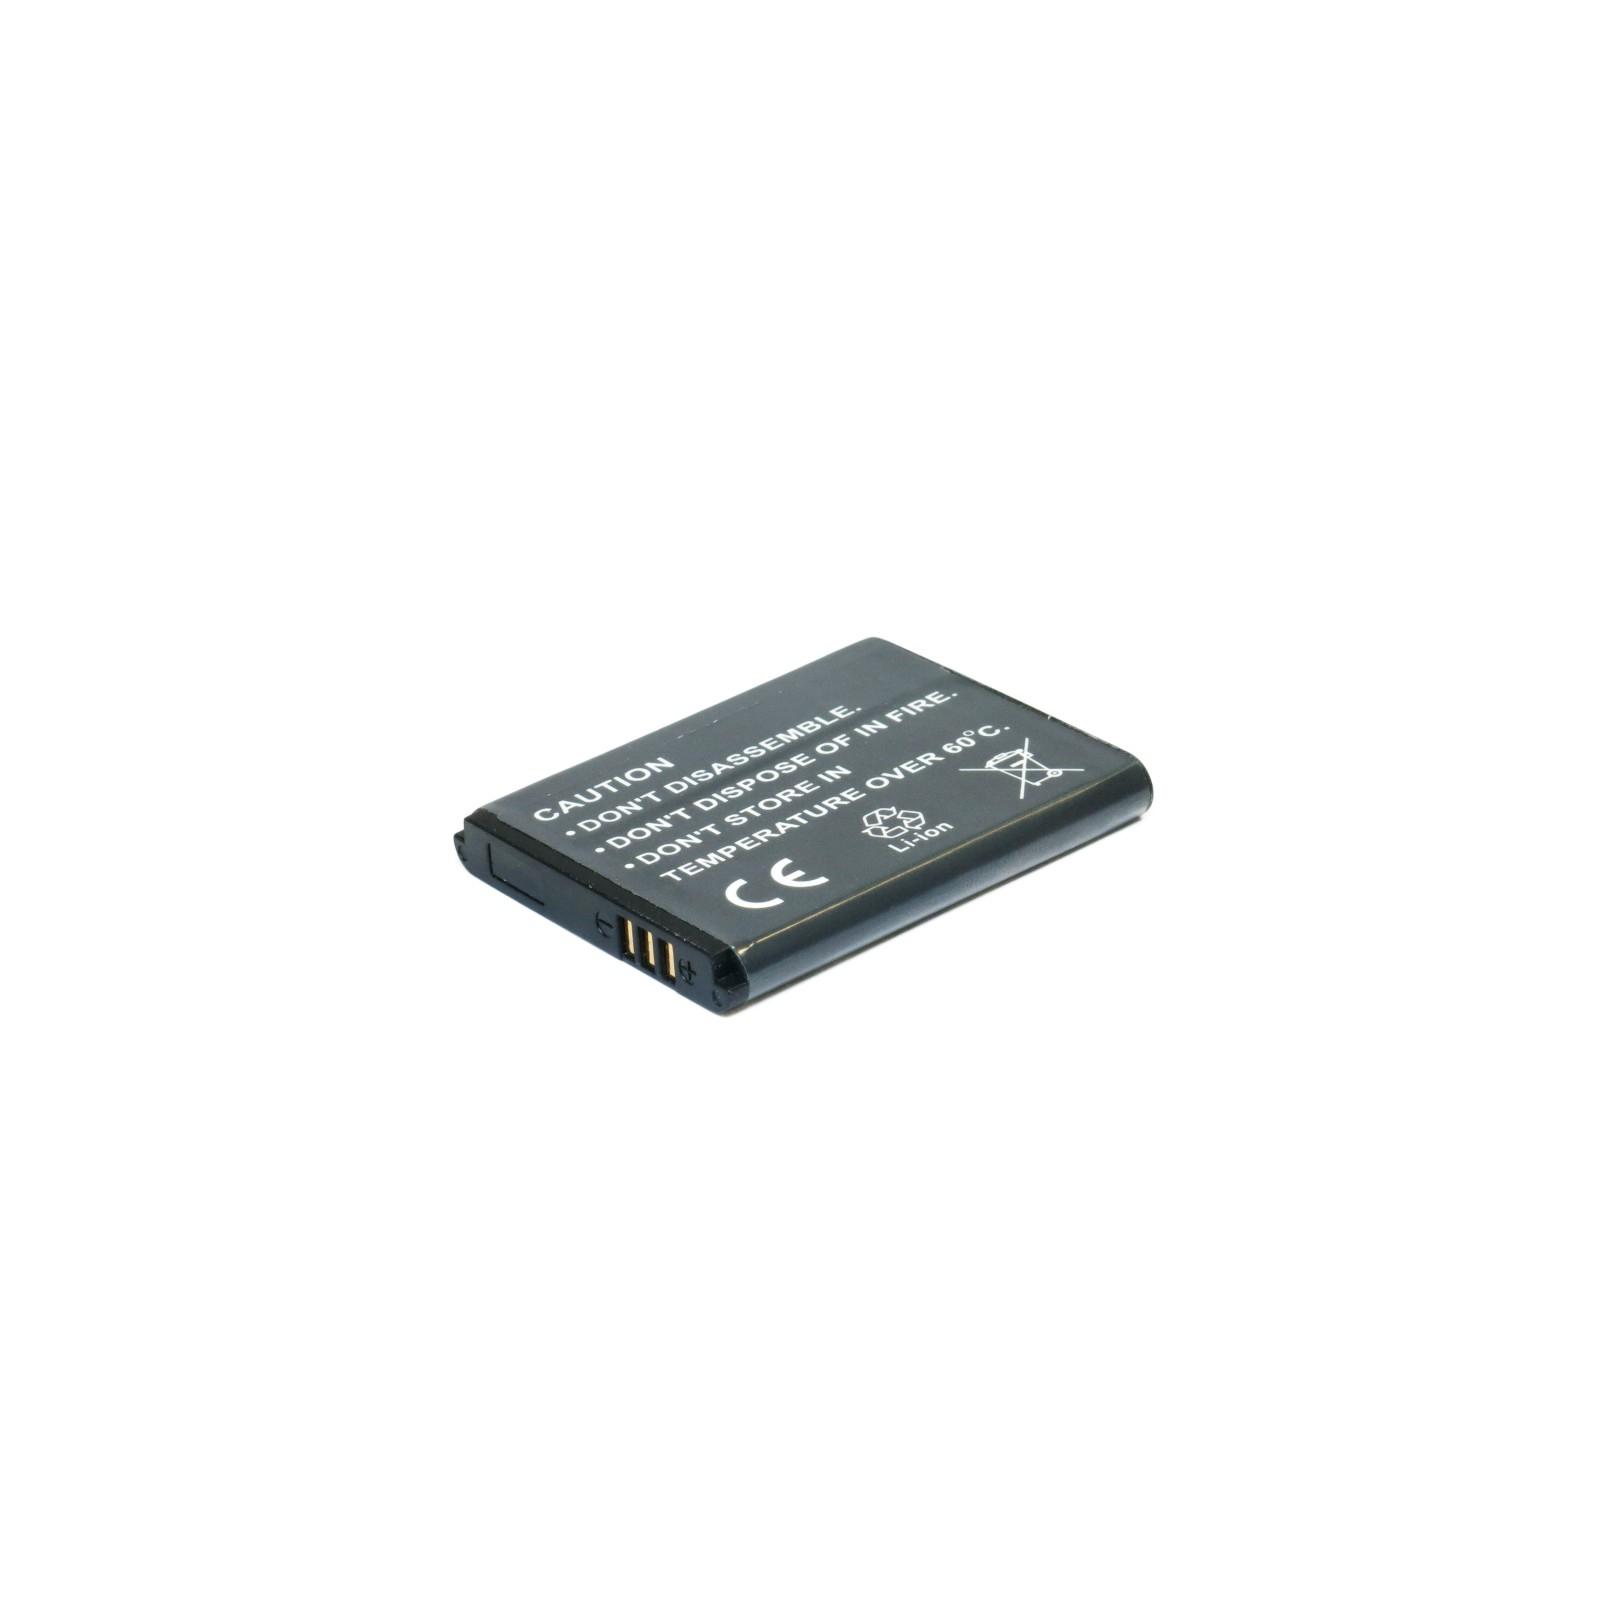 Аккумулятор к фото/видео EXTRADIGITAL Samsung BP88B, Li-ion, 880 mAh (DV00DV1385) изображение 5